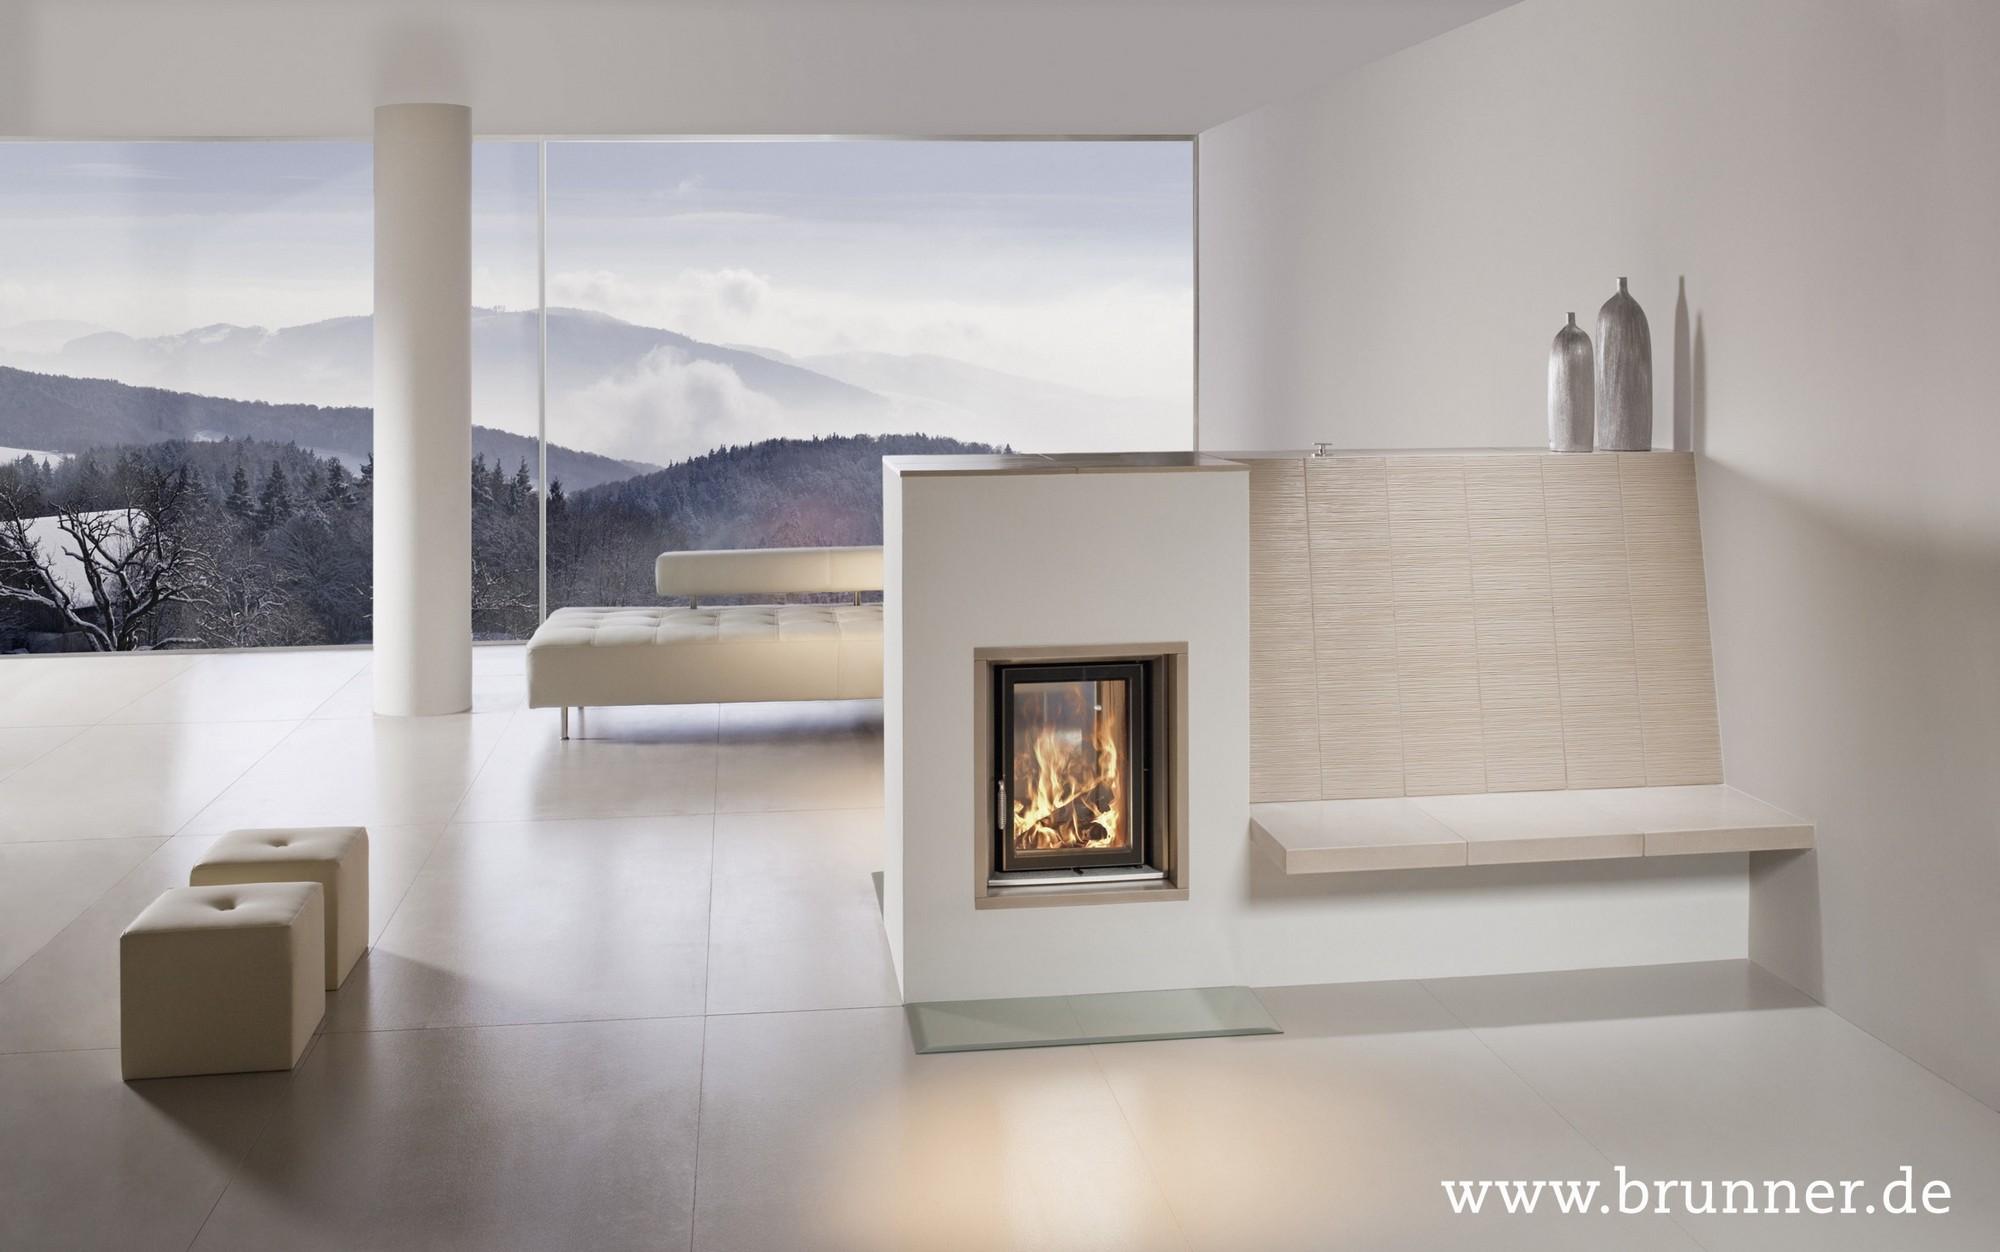 brunner hkd2 2 speicherofen tunnel grundofen. Black Bedroom Furniture Sets. Home Design Ideas